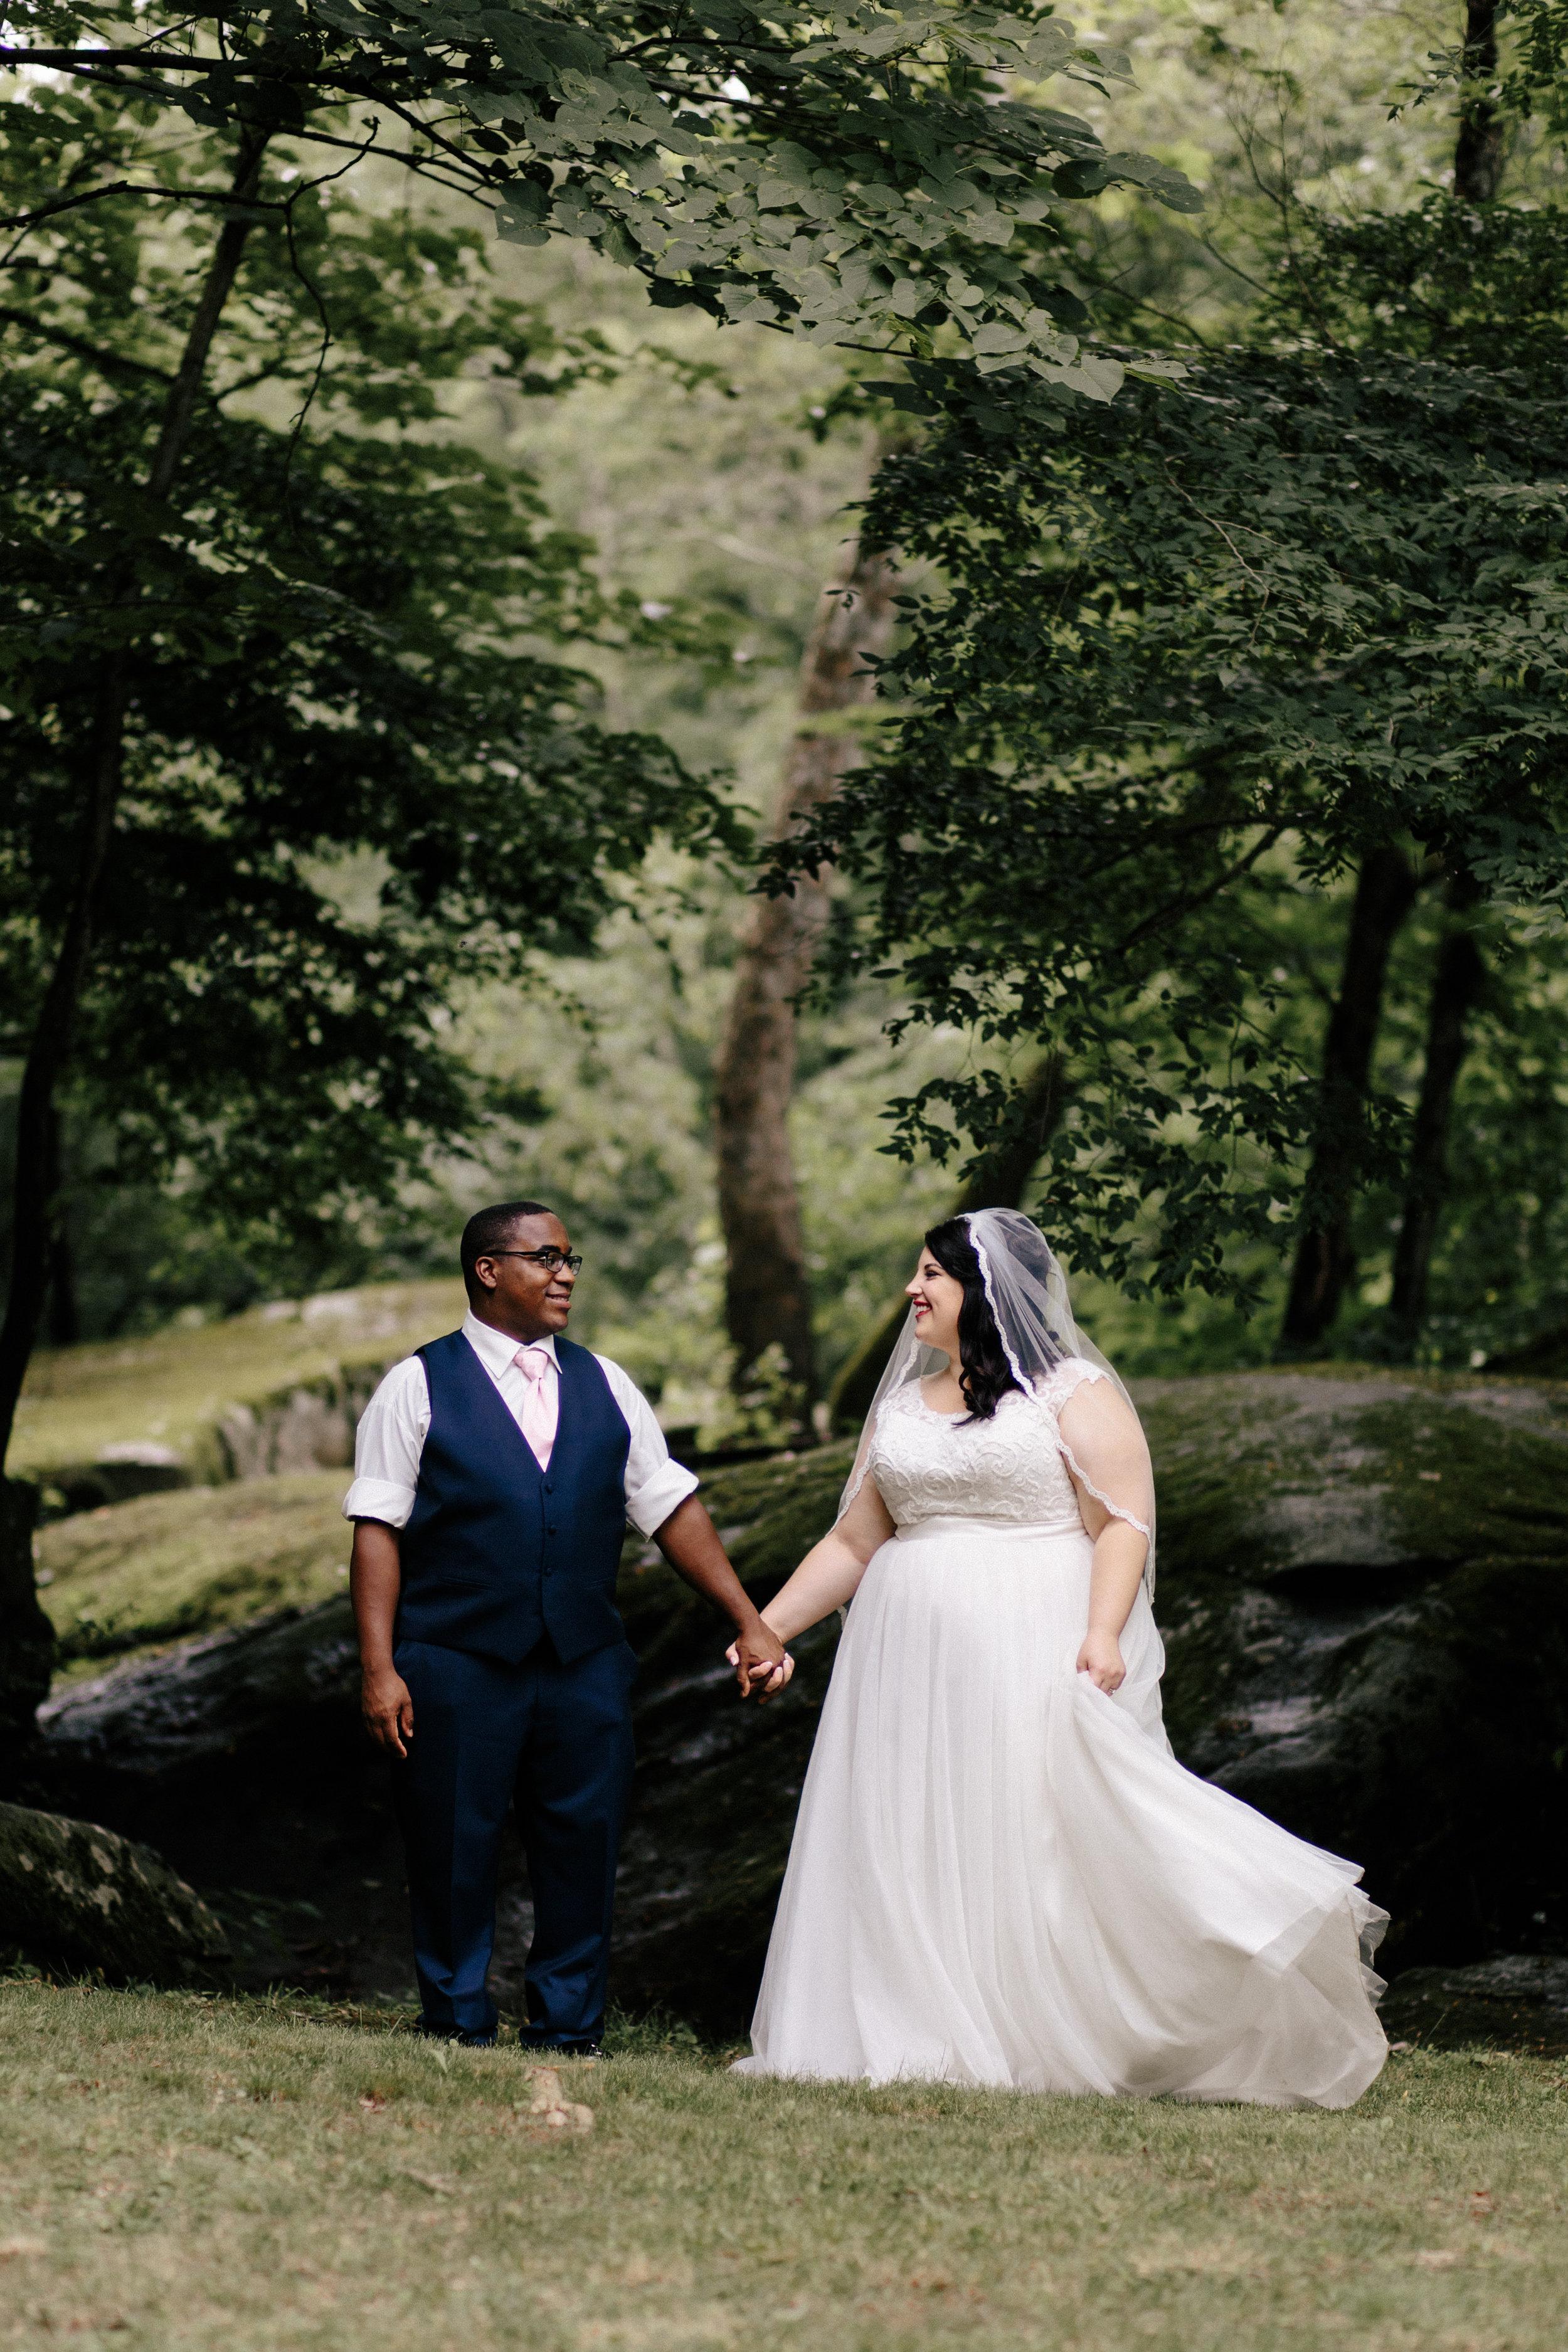 saundra_megan_wedding_photography7-5.jpg